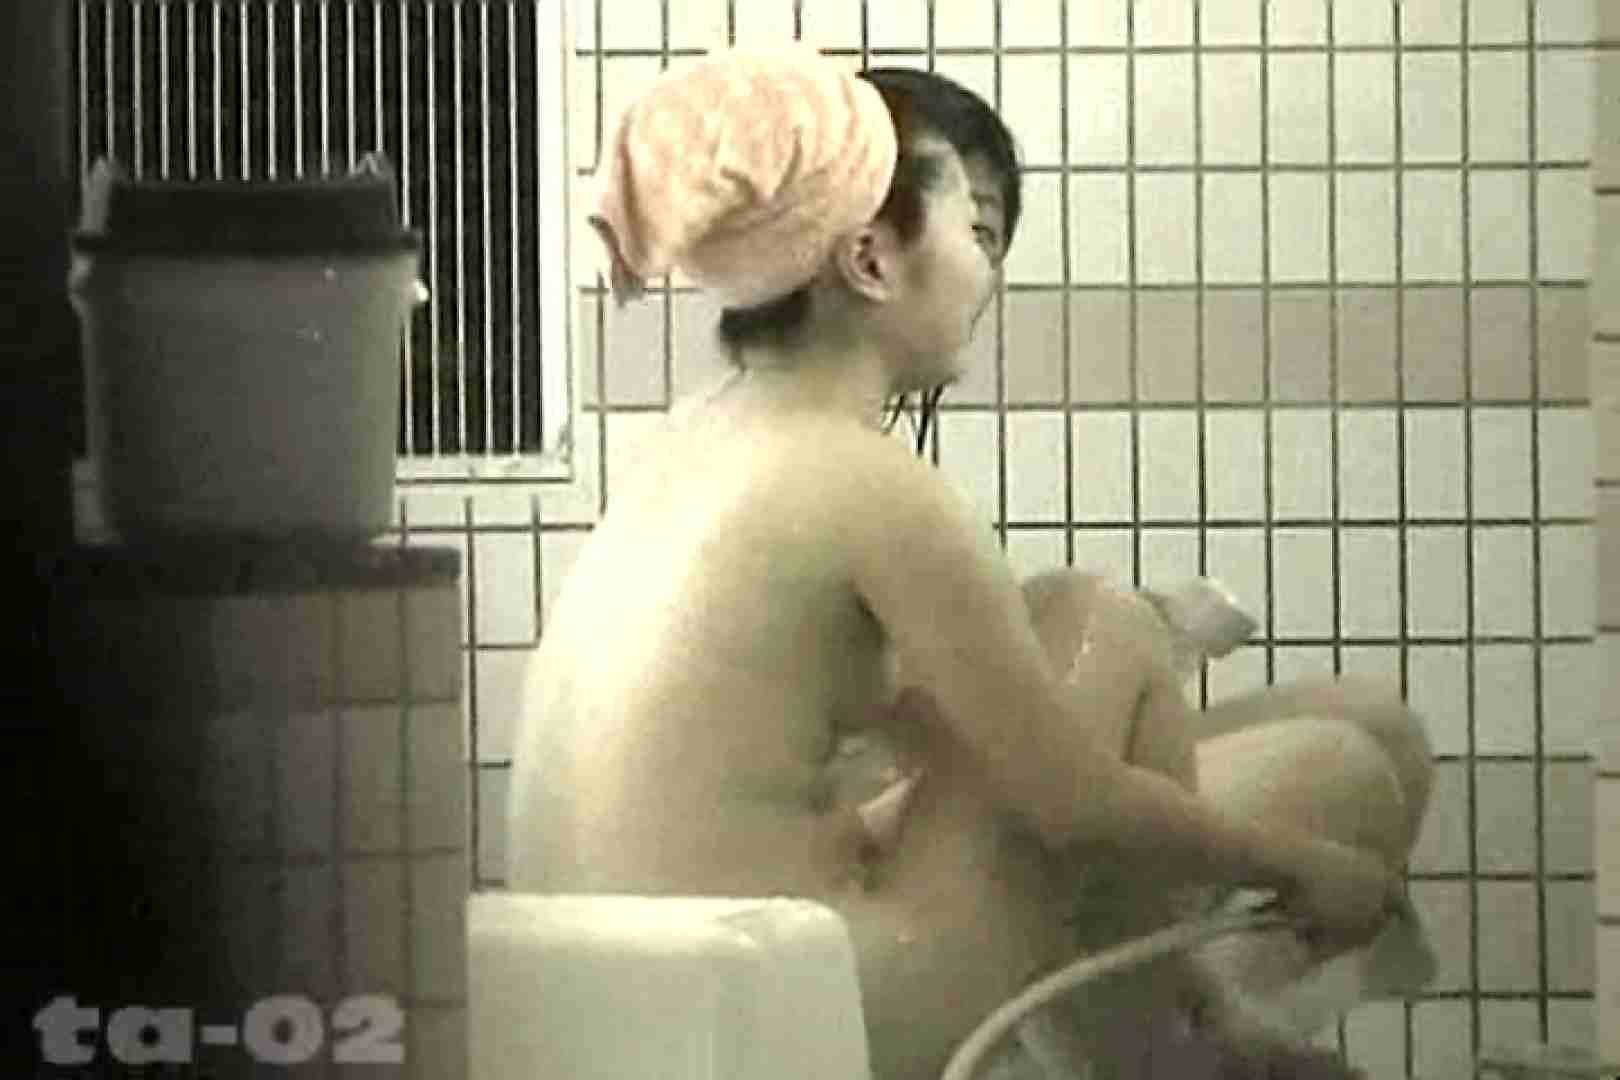 合宿ホテル女風呂盗撮高画質版 Vol.02 盗撮  81PIX 77